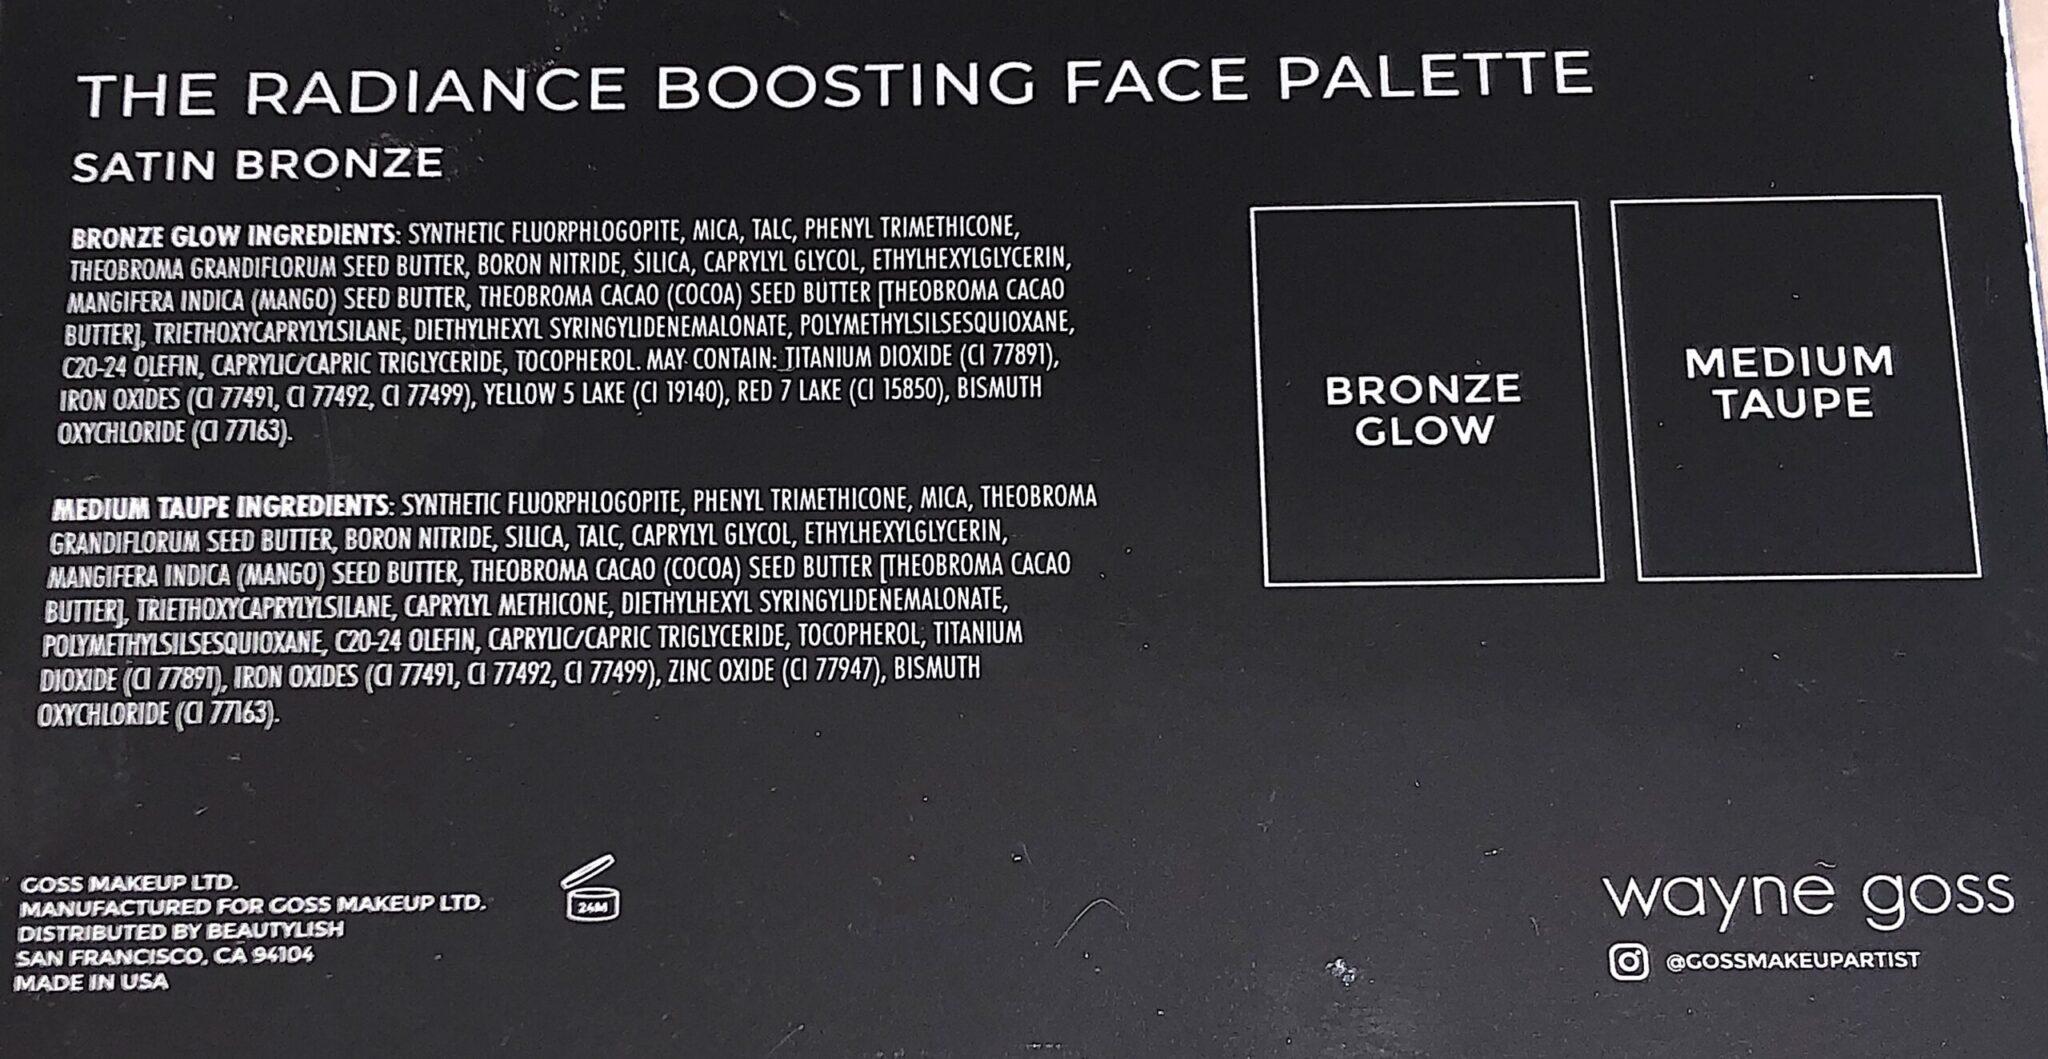 WAYNE GOSS RADIANCE BOOSTING FACE PALETTE INGREDIENTS FOR THE SATIN BRONZE PALETTE